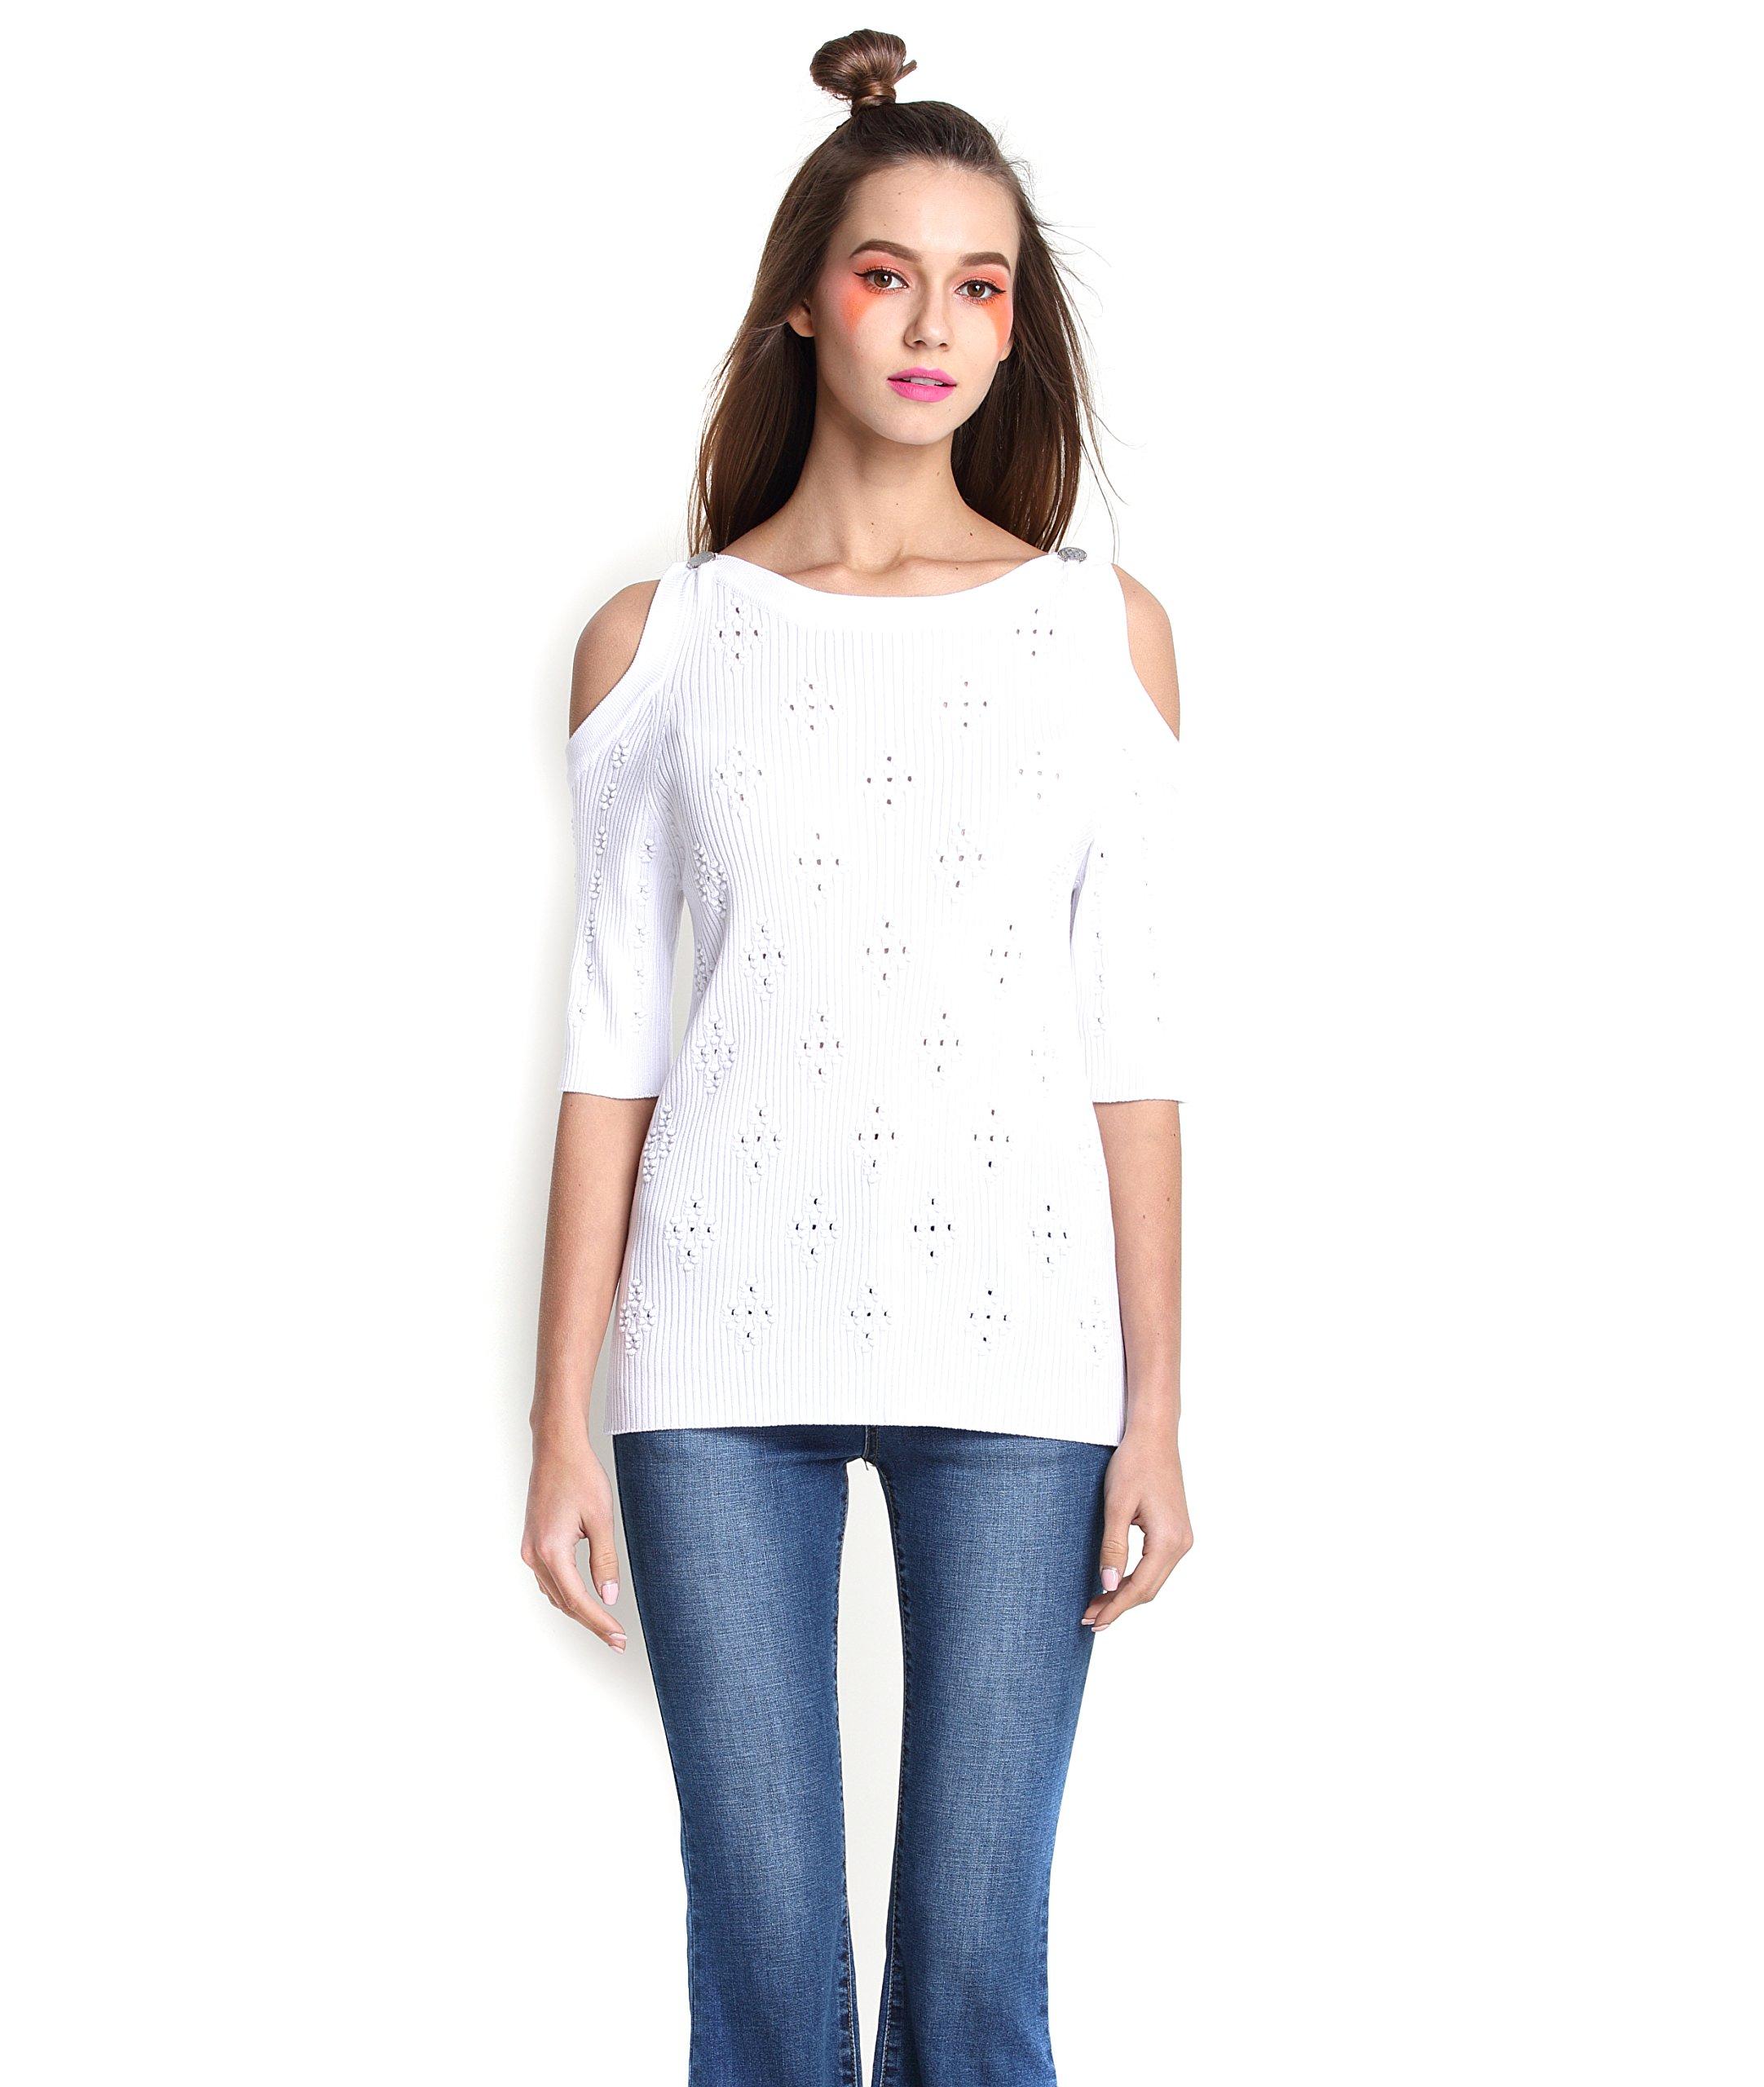 Eileen&Elisa Sweater Women Summer Casual Short Sleeve Knitted Short Pullover (White)